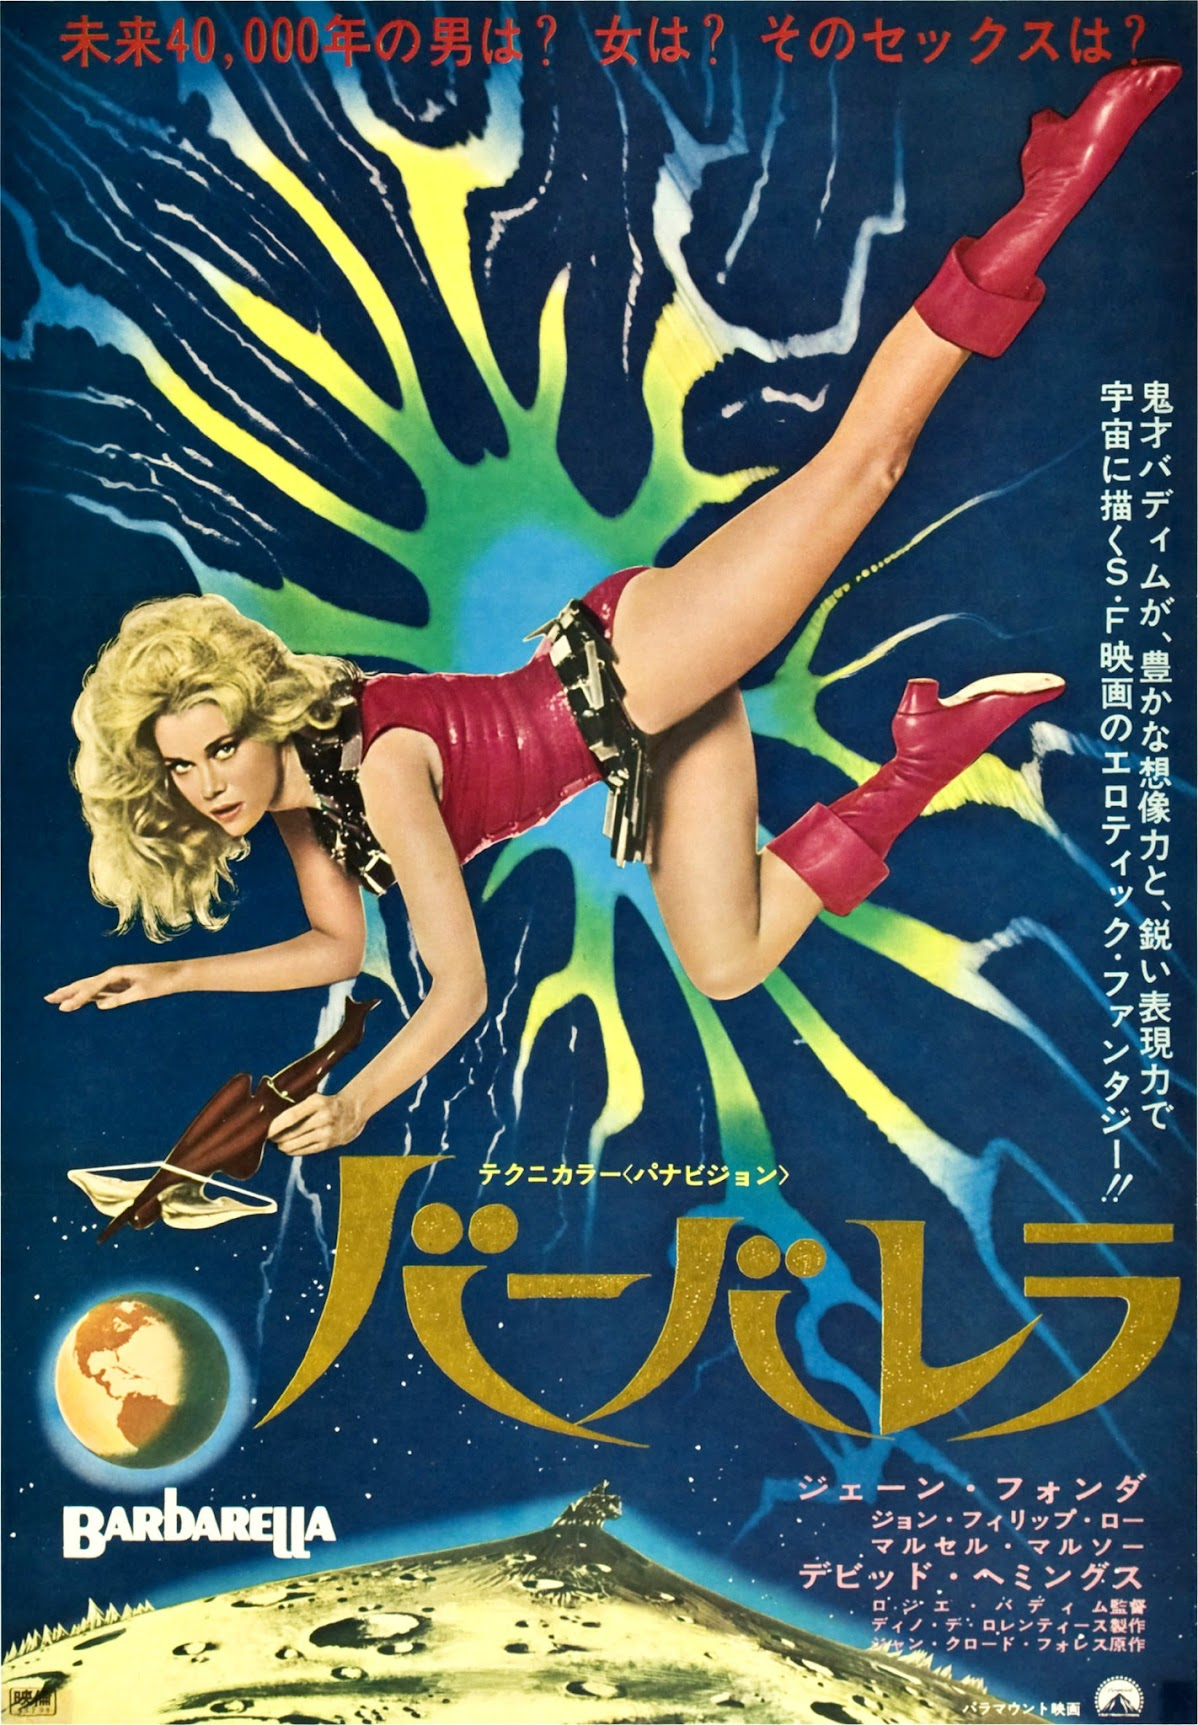 http://2.bp.blogspot.com/-EG2zDnlQzDU/UQcS1tCKz3I/AAAAAAAALUg/lCpWaAc-pFA/s1725/barbarella_poster_07.jpg